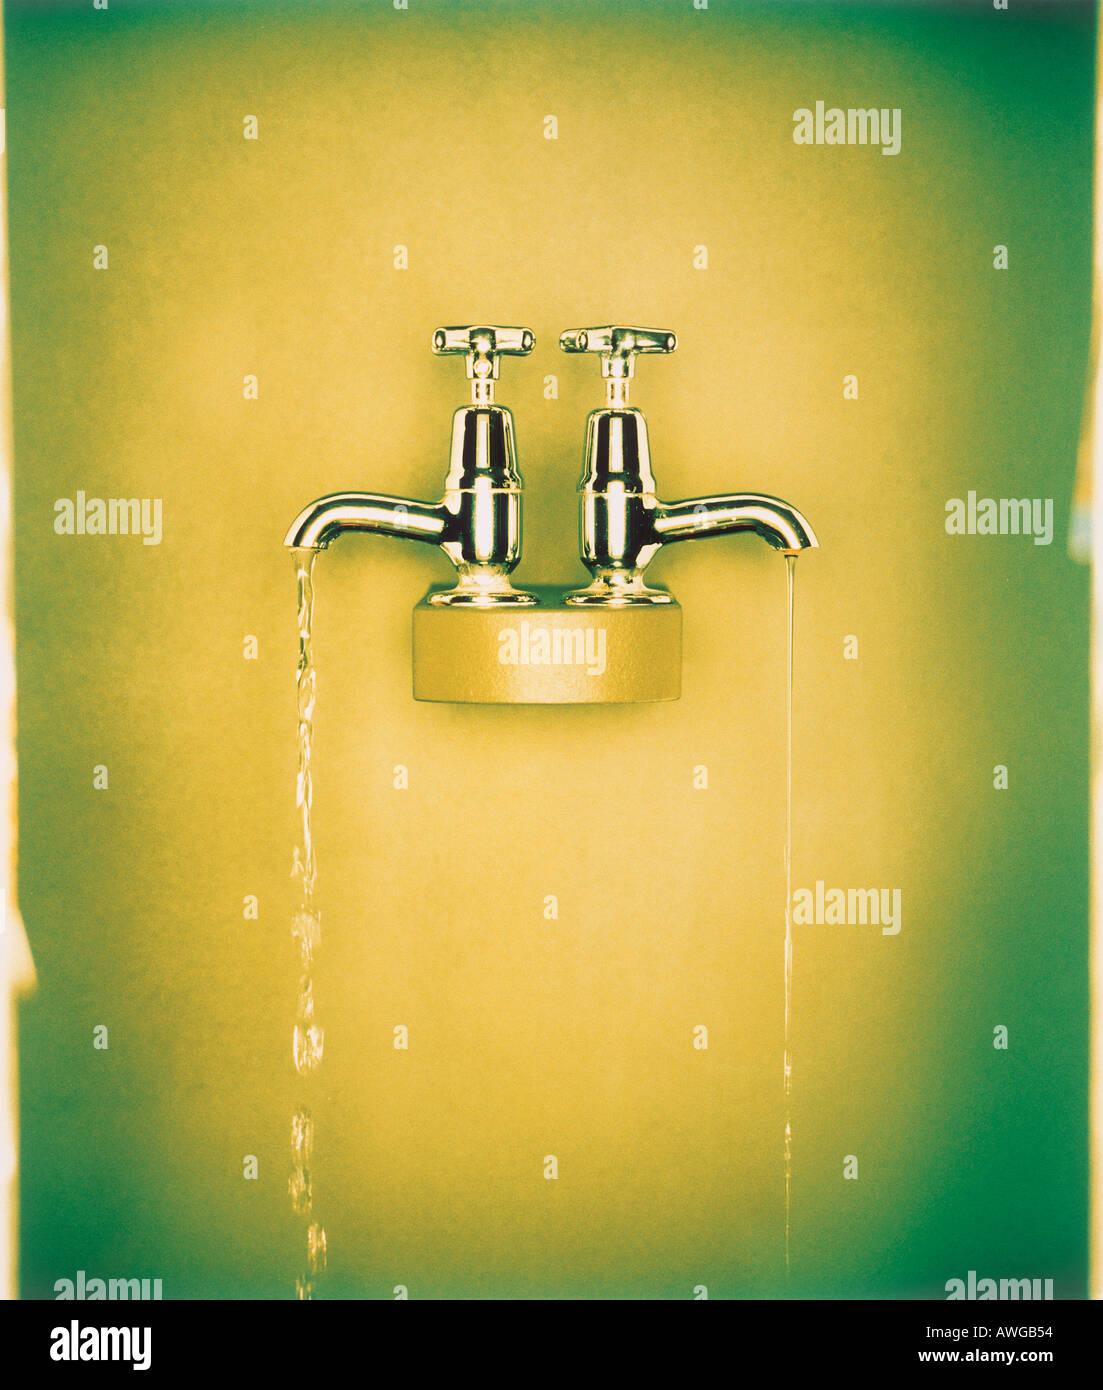 Taps running water - Stock Image